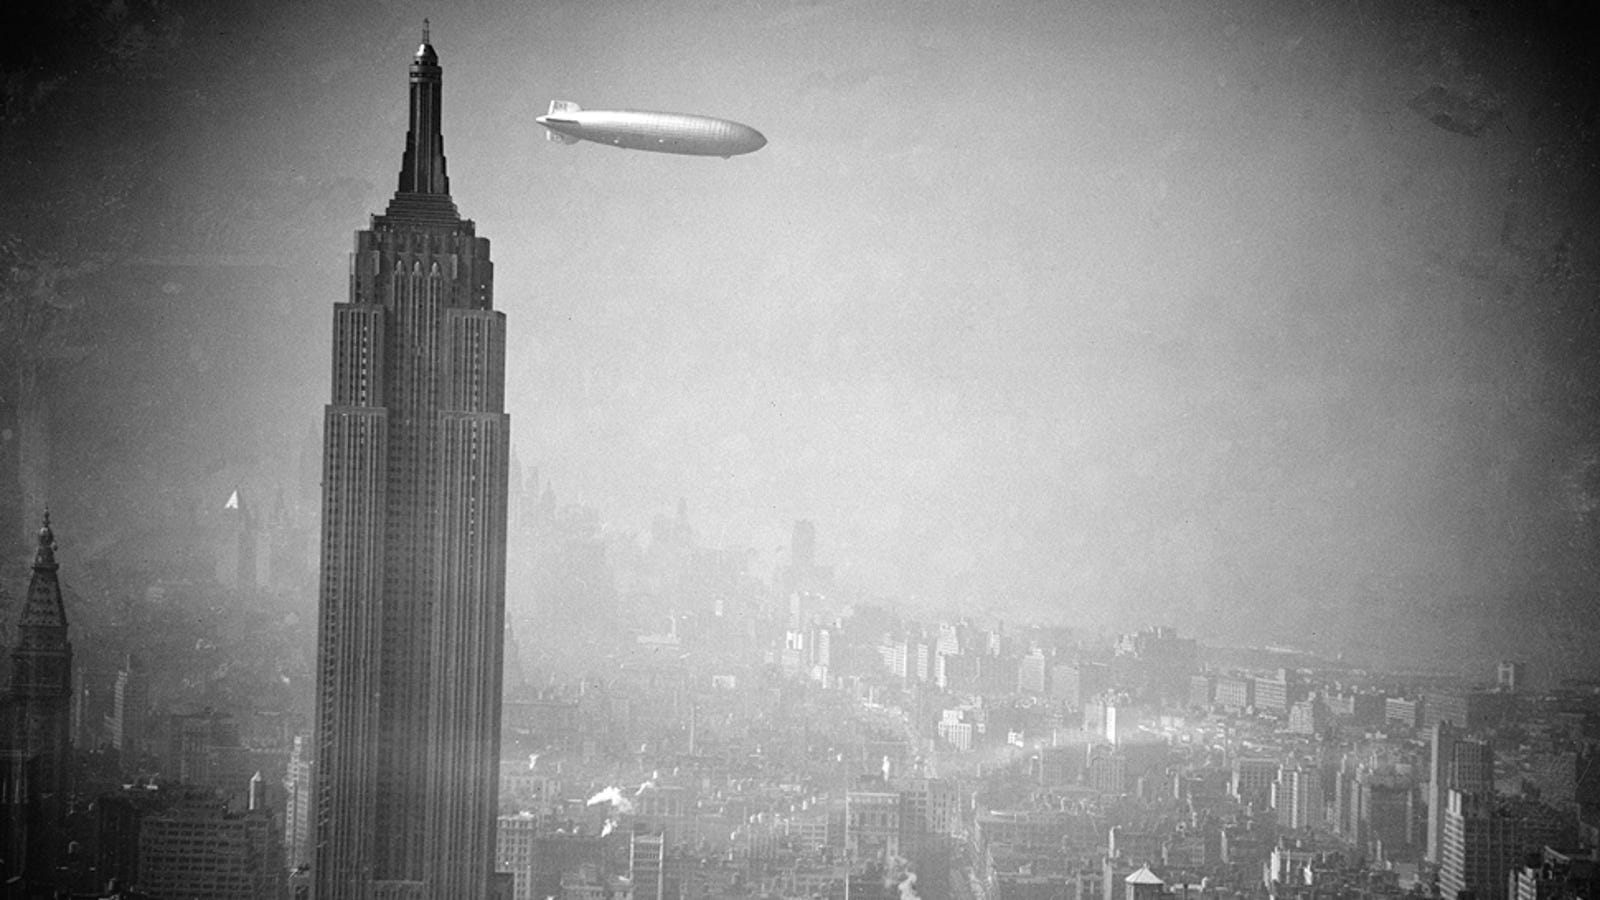 Age of zeppelins - 4 7